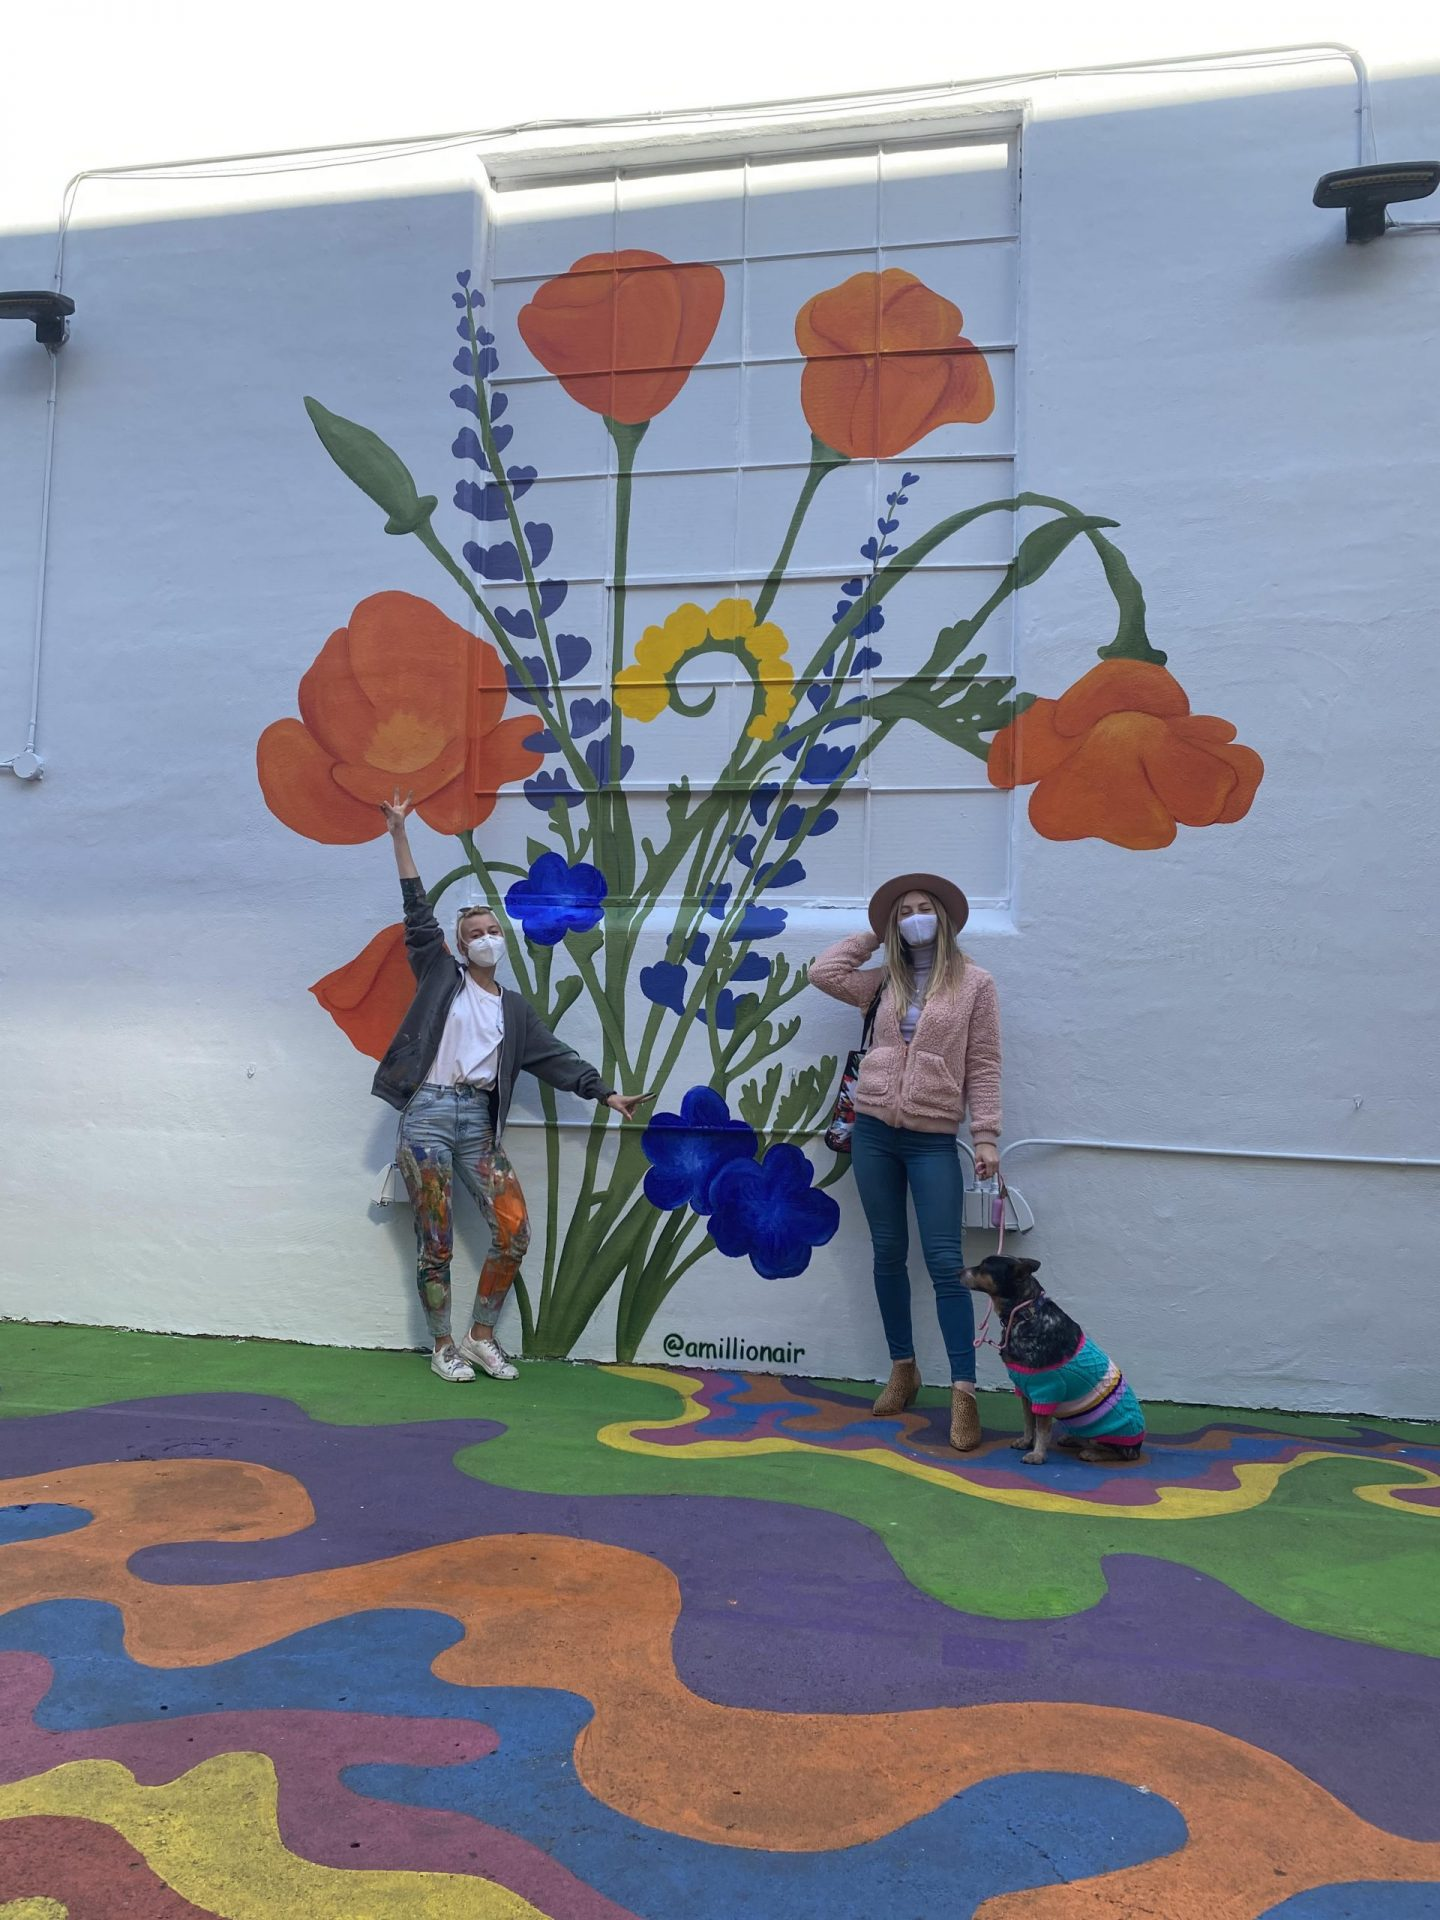 amillionair-kate-tova-california-wildflower-mural-umberella-alley